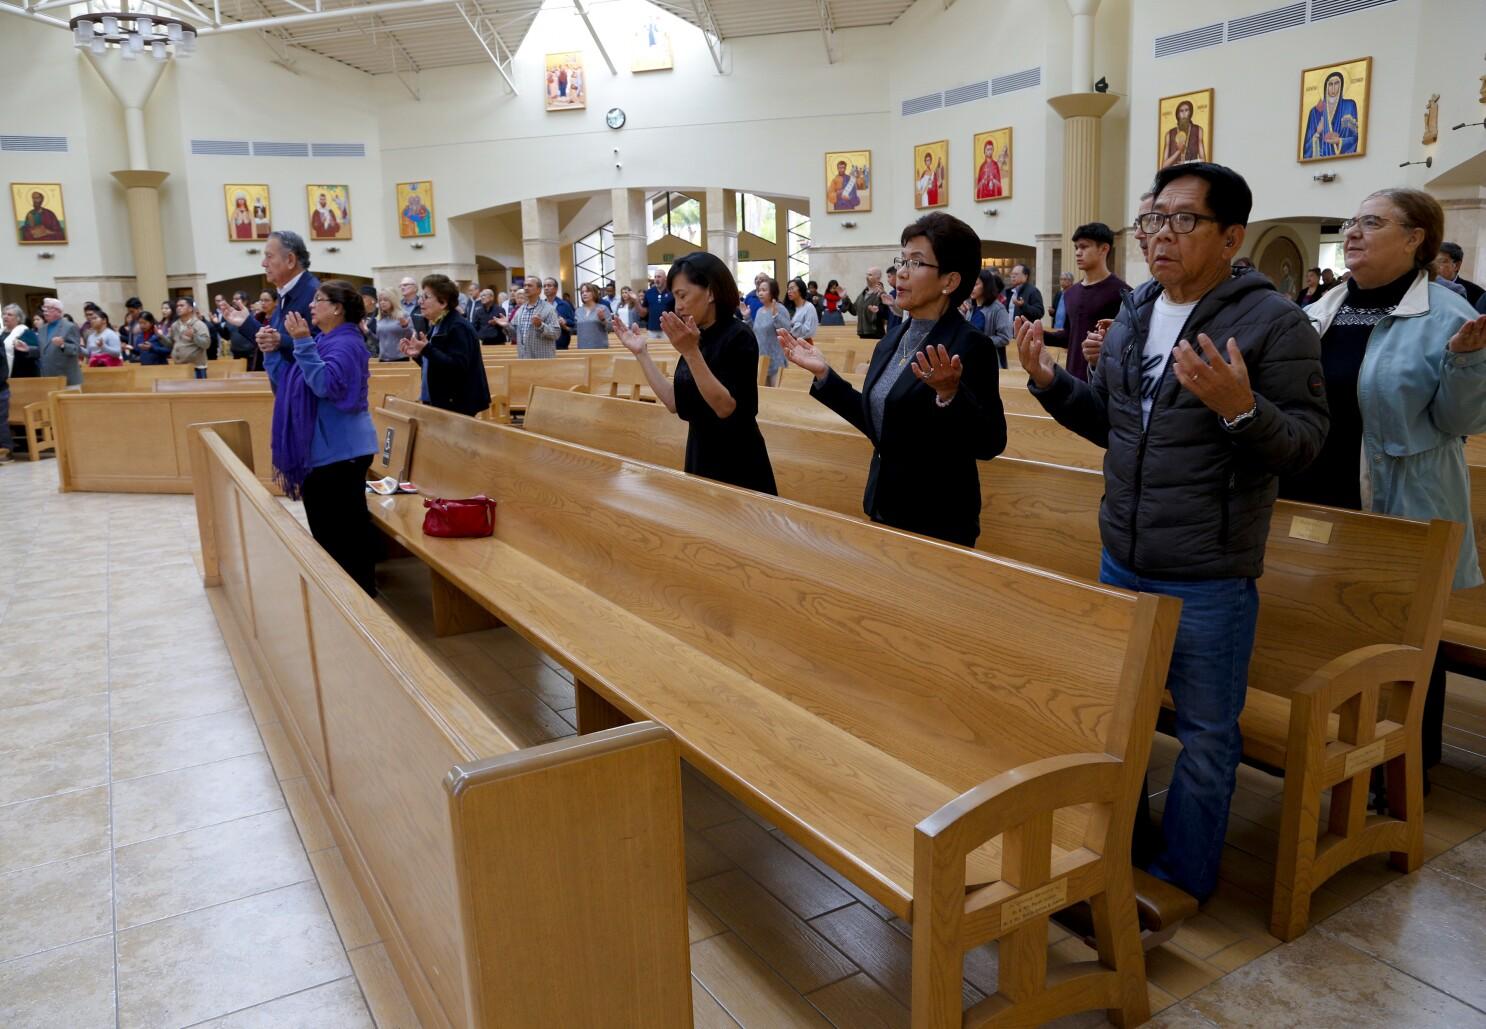 Met Church Keller Christmas Service Times 2020 Coronavirus: Some San Diego church services still happened Sunday